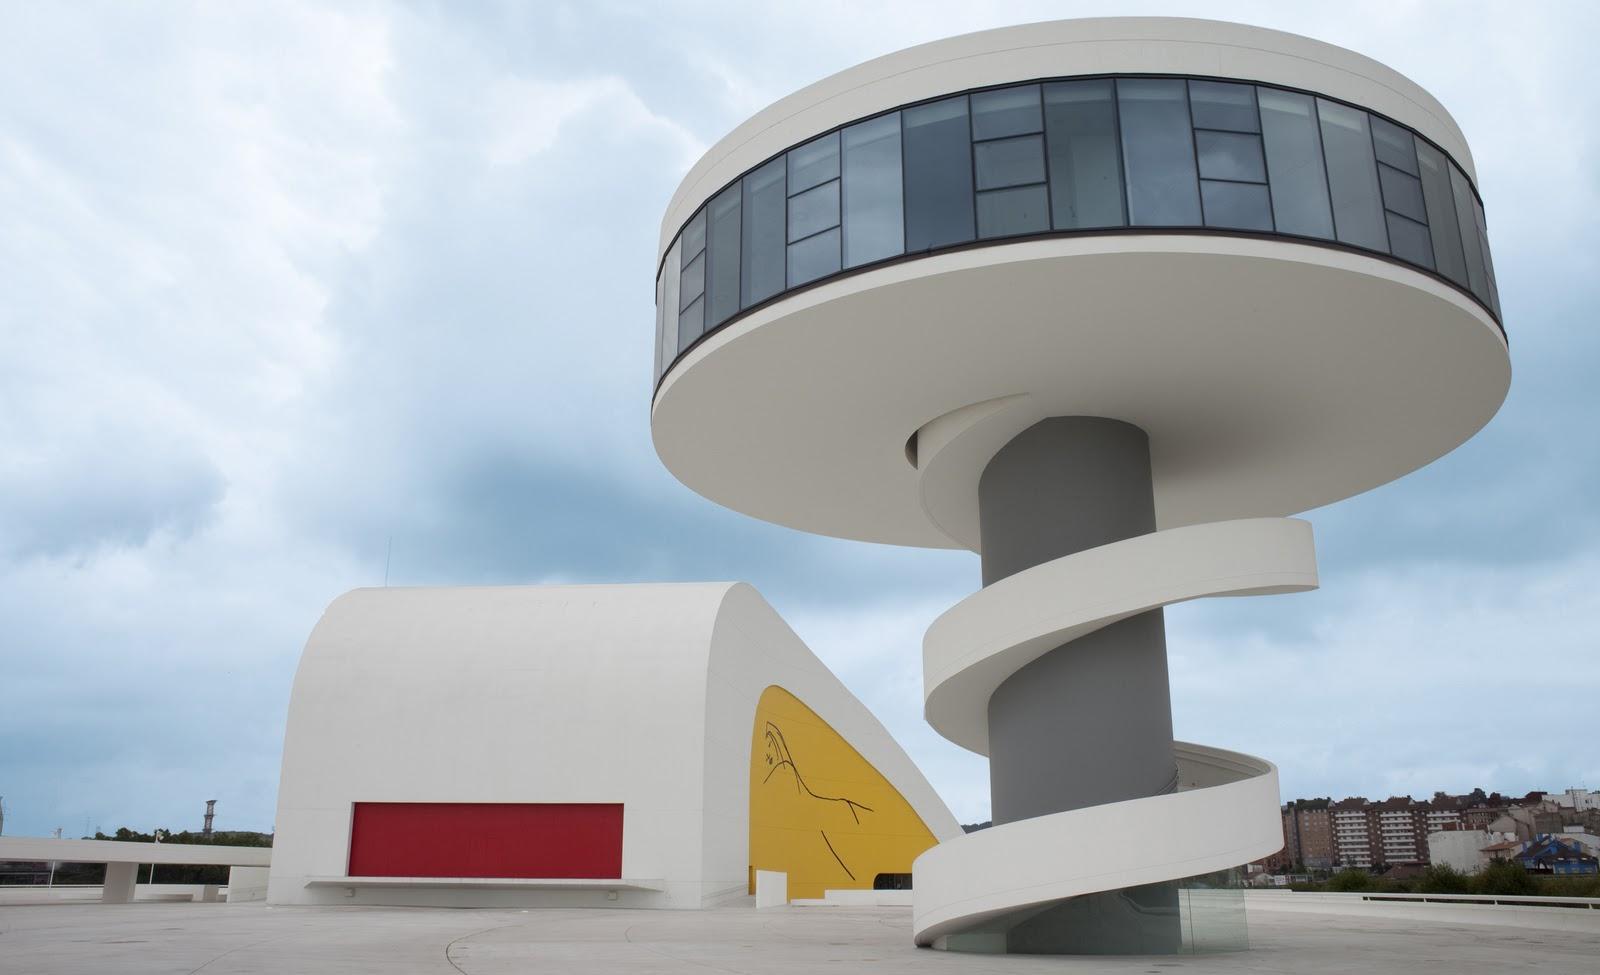 Patrimonio arquitect nico de asturias niemeyer en aviles - Arquitectos aviles ...